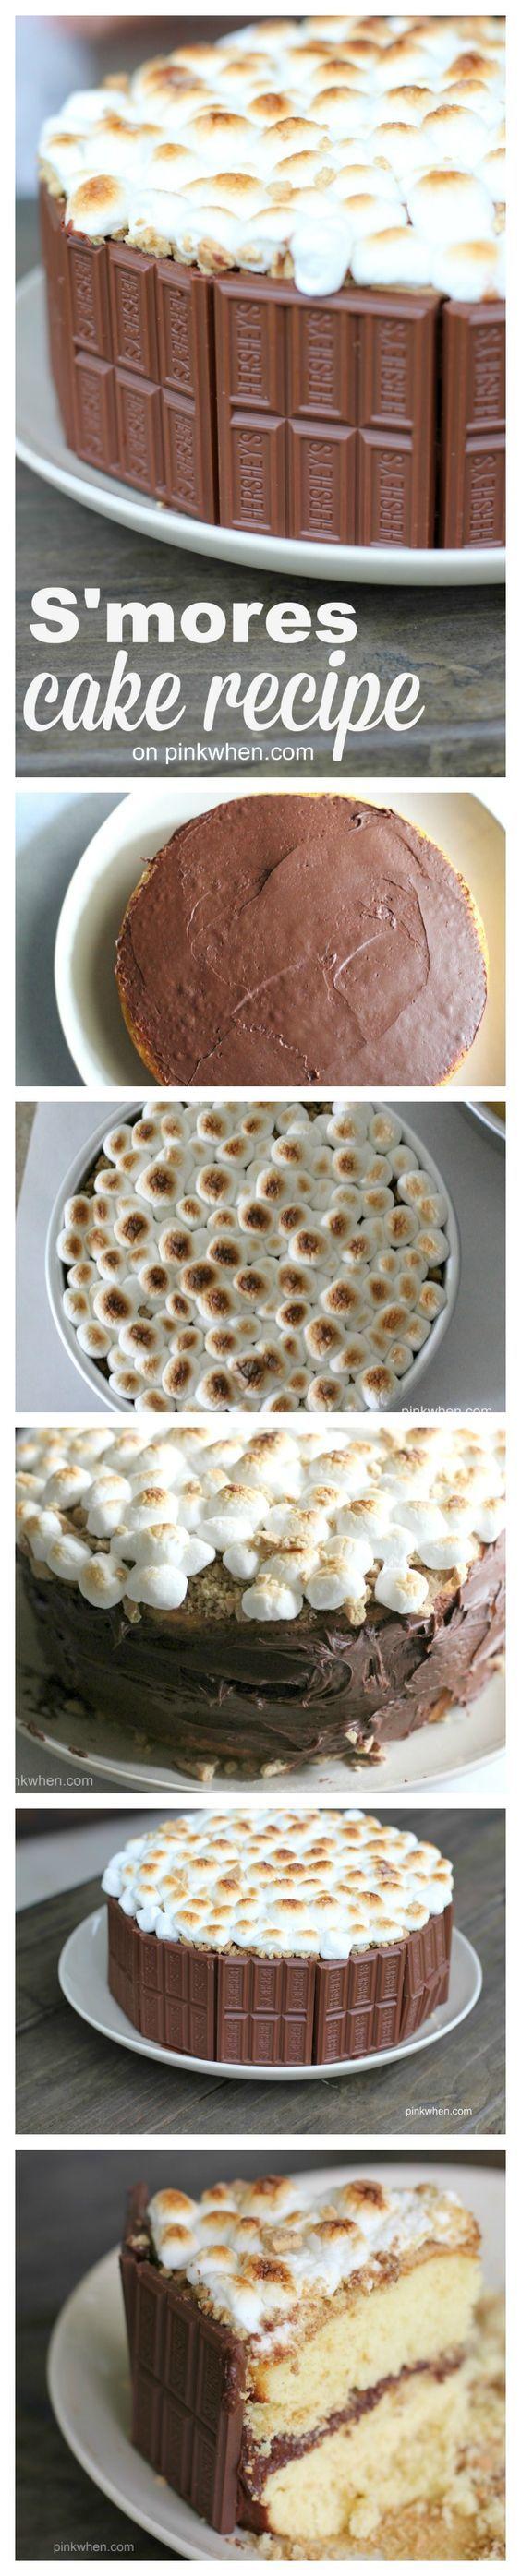 Best 20+ Hershey chocolate ideas on Pinterest | Homemade chocolate ...